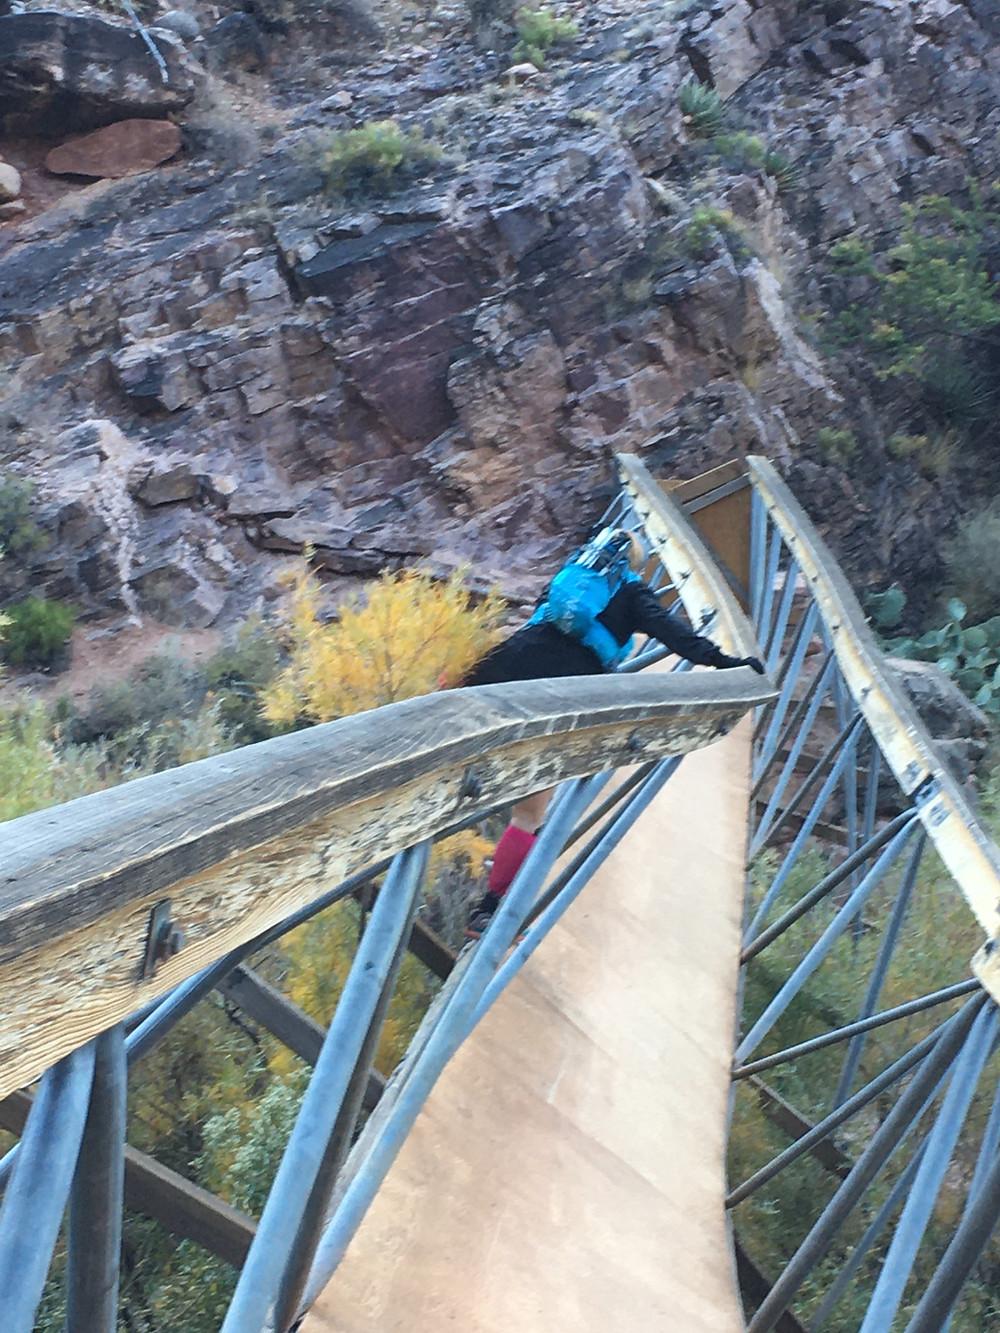 Washed out bridge by Ribbon falls, Arizona